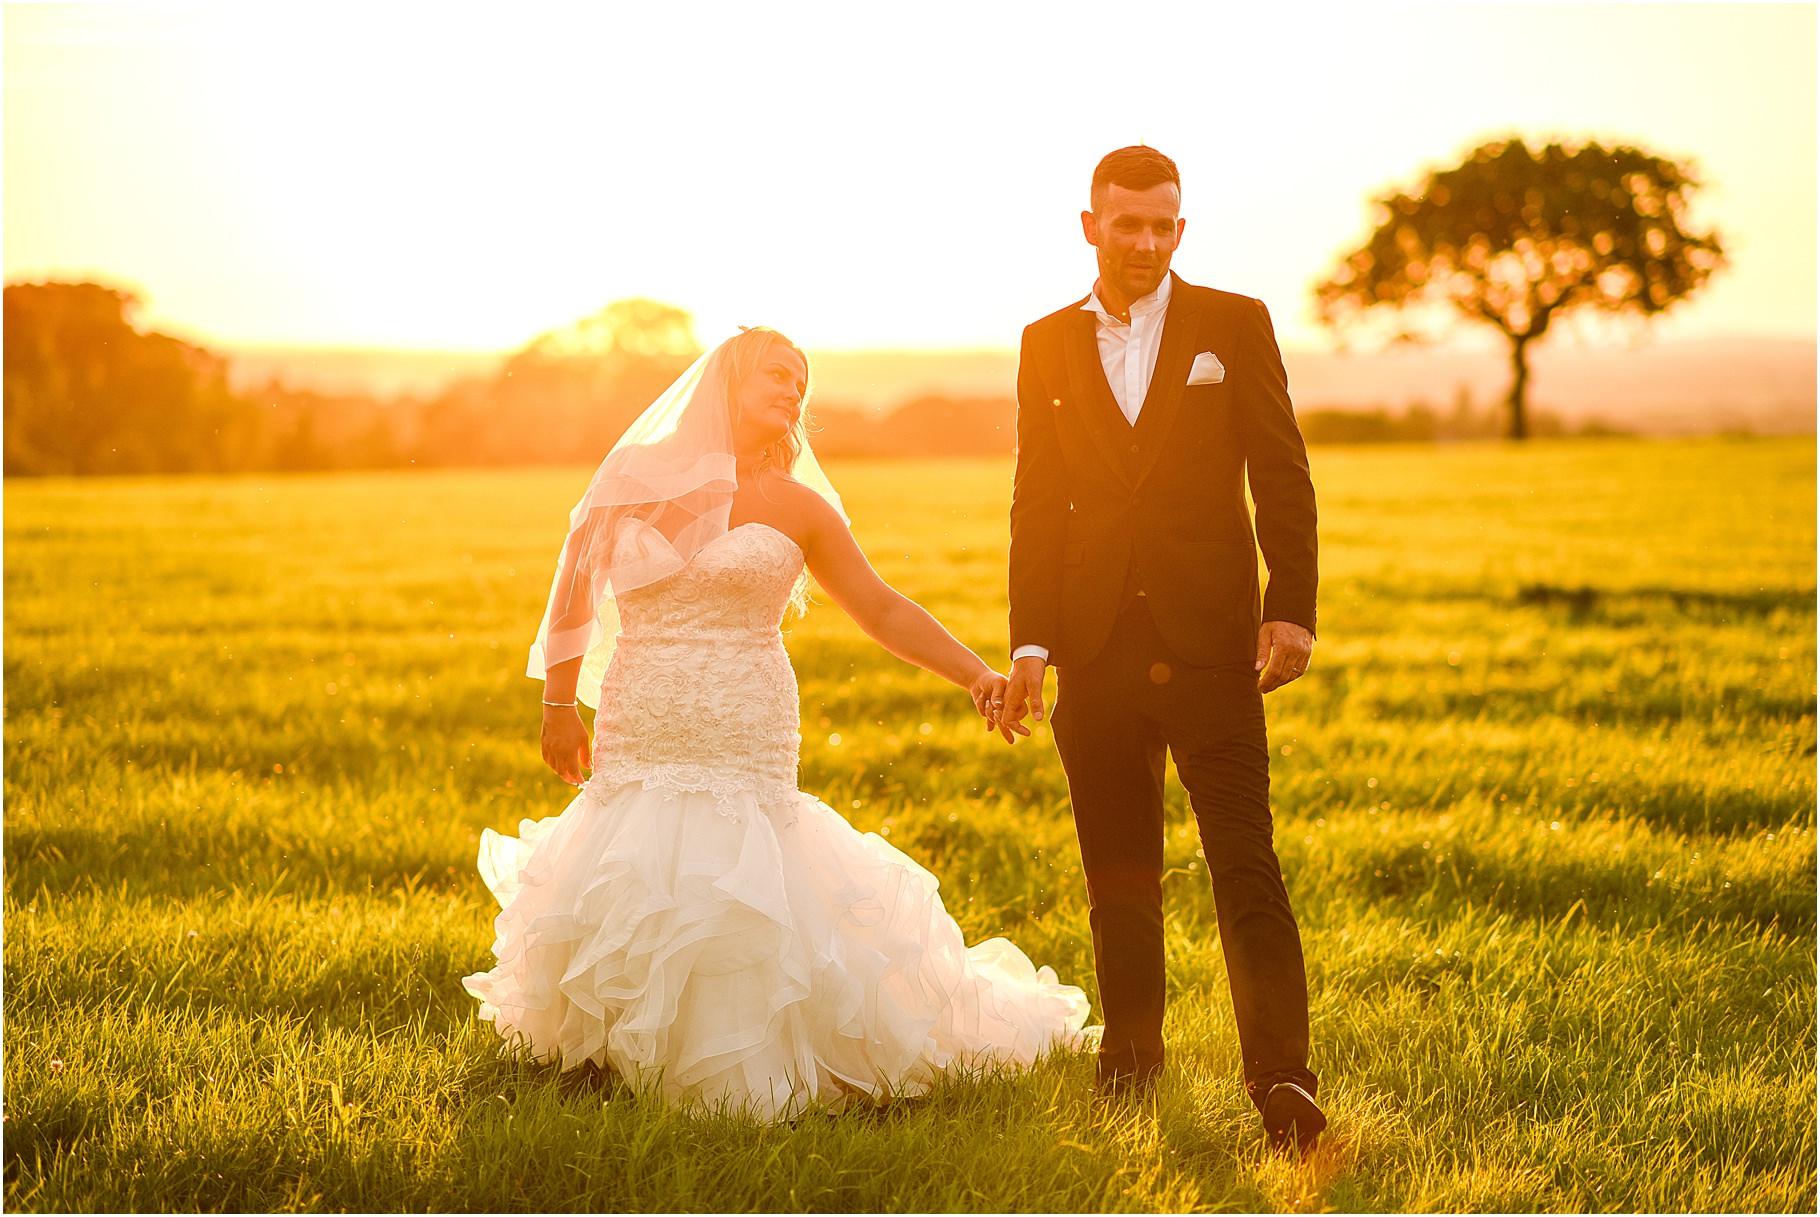 dan-wootton-photography-2017-weddings-108.jpg